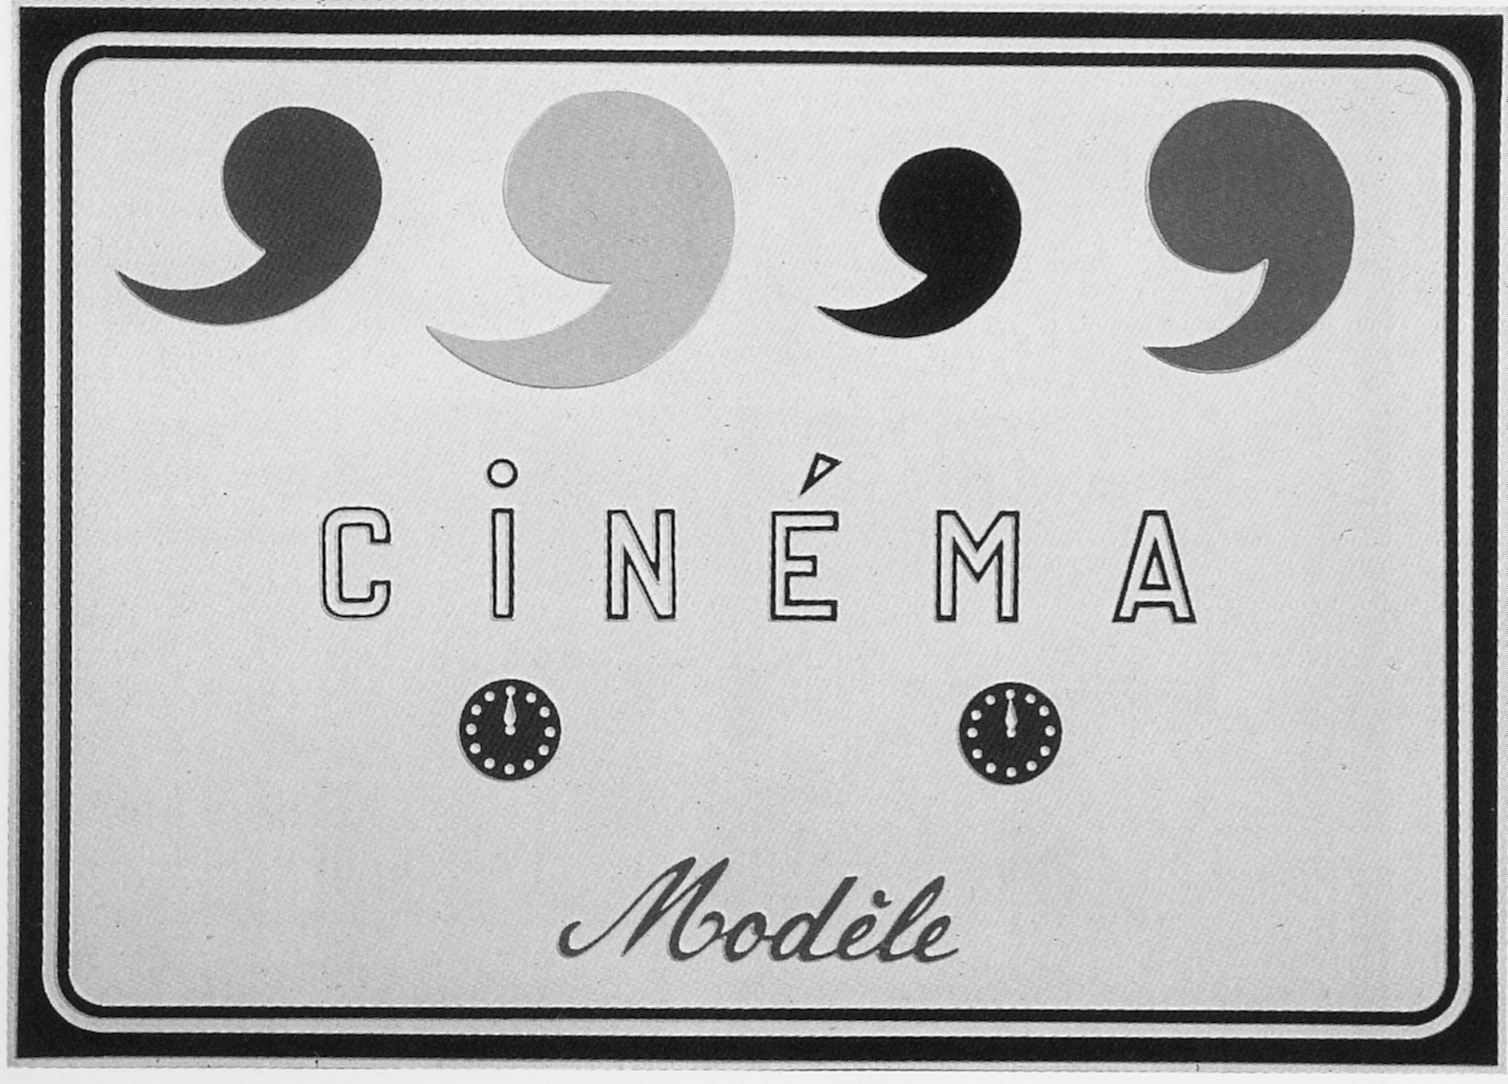 cinema modele